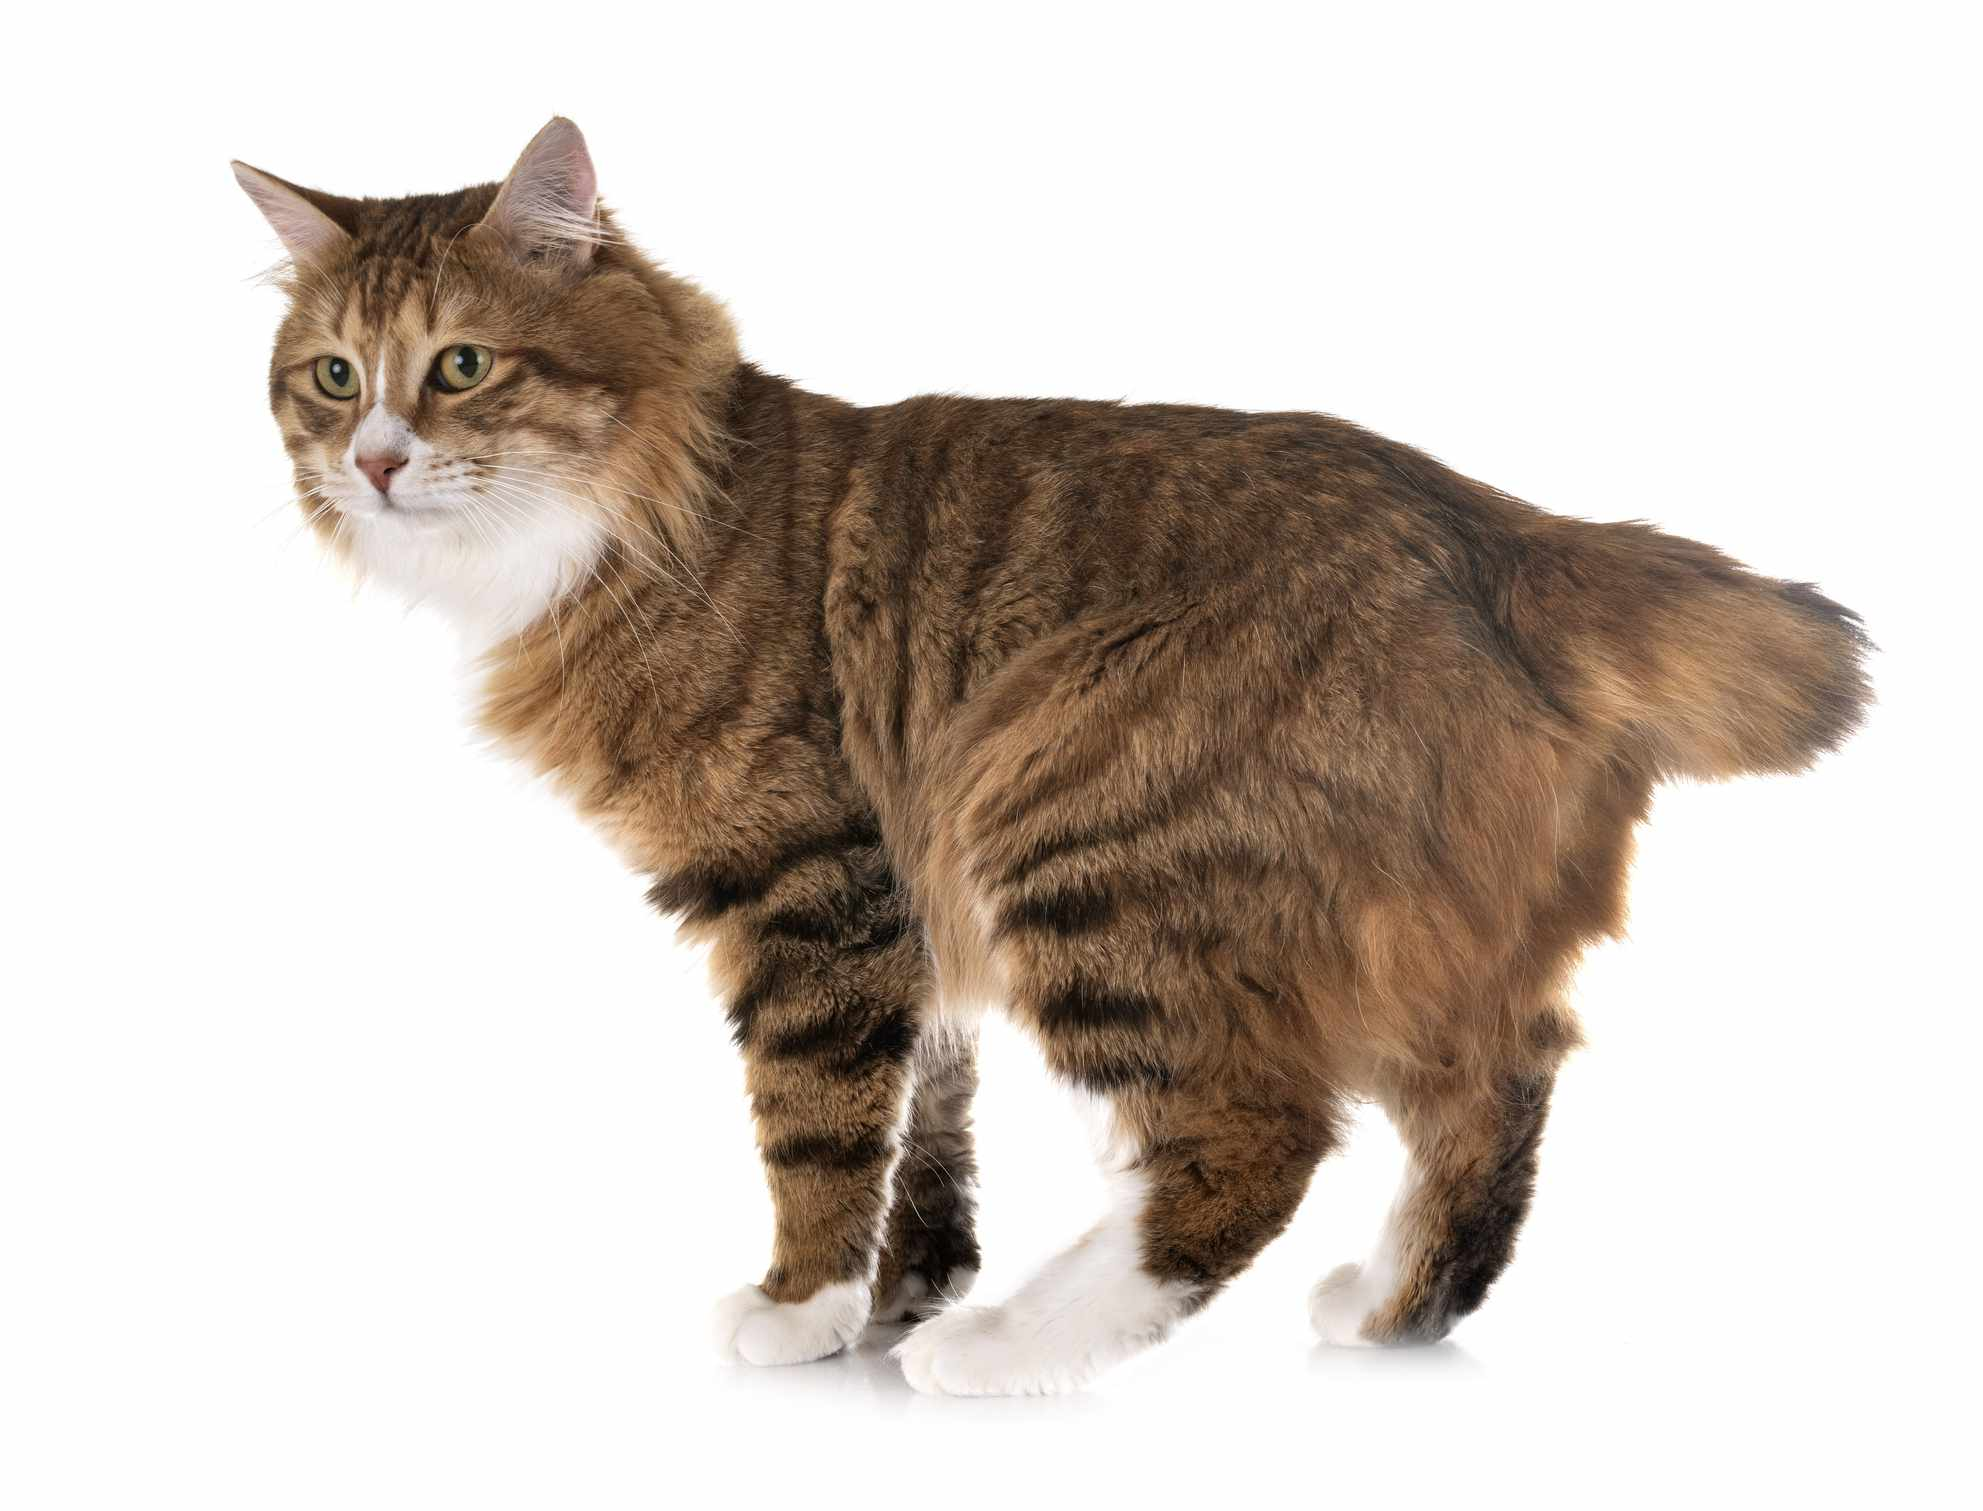 Kurilian Bobtail cat standing